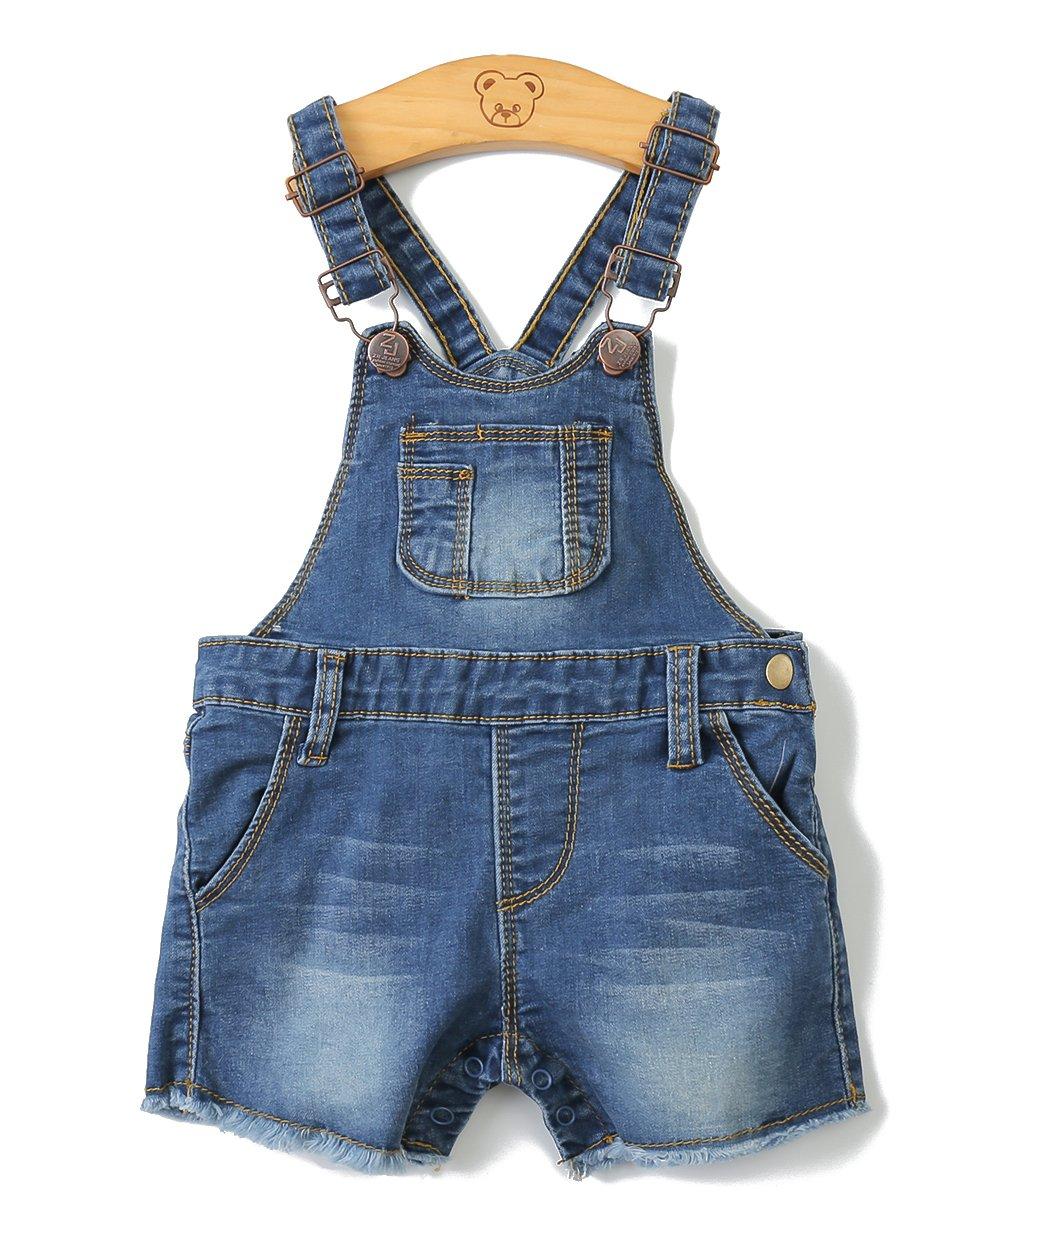 Baby Girls/Boys Big Bibs Raw Edge Light Blue Summer Jeans Shortalls,Light Blue,2-3 Years